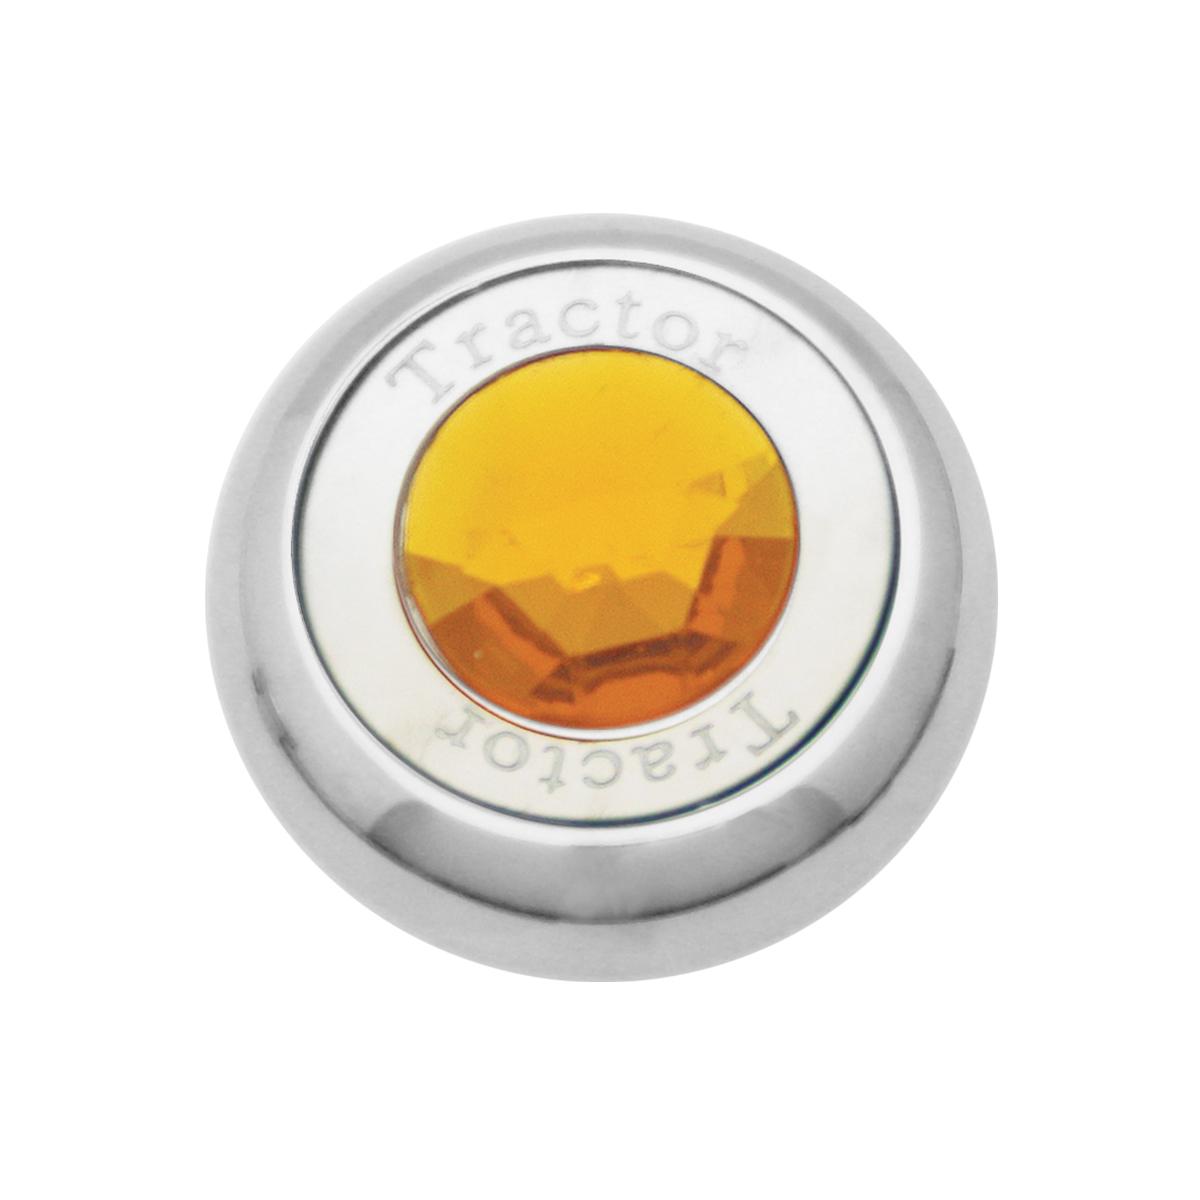 95370 Chrome Screw-In Air Valve Control Knob w/ Crystal